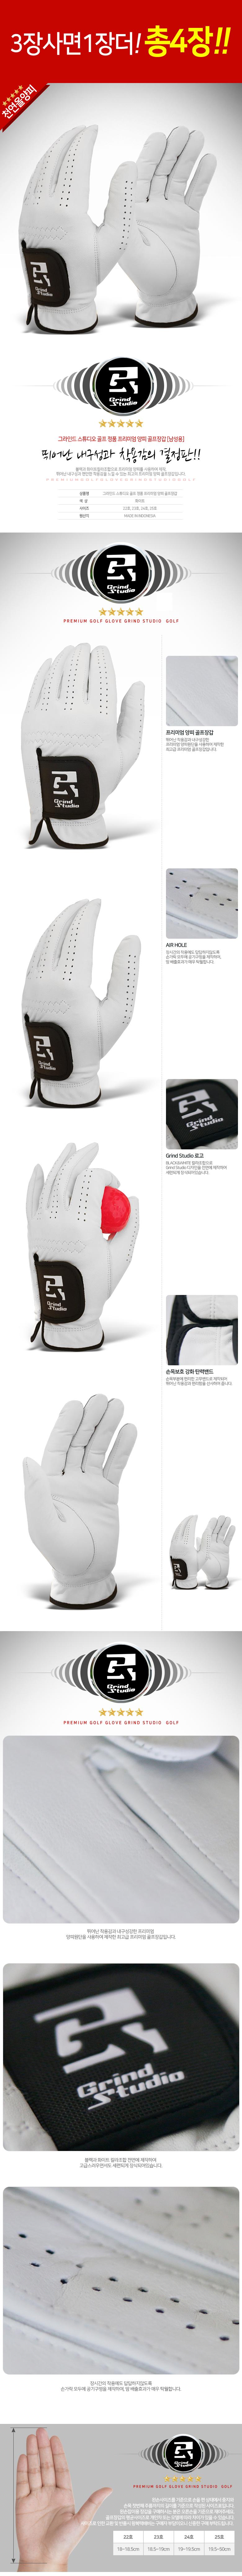 glove_4set.jpg